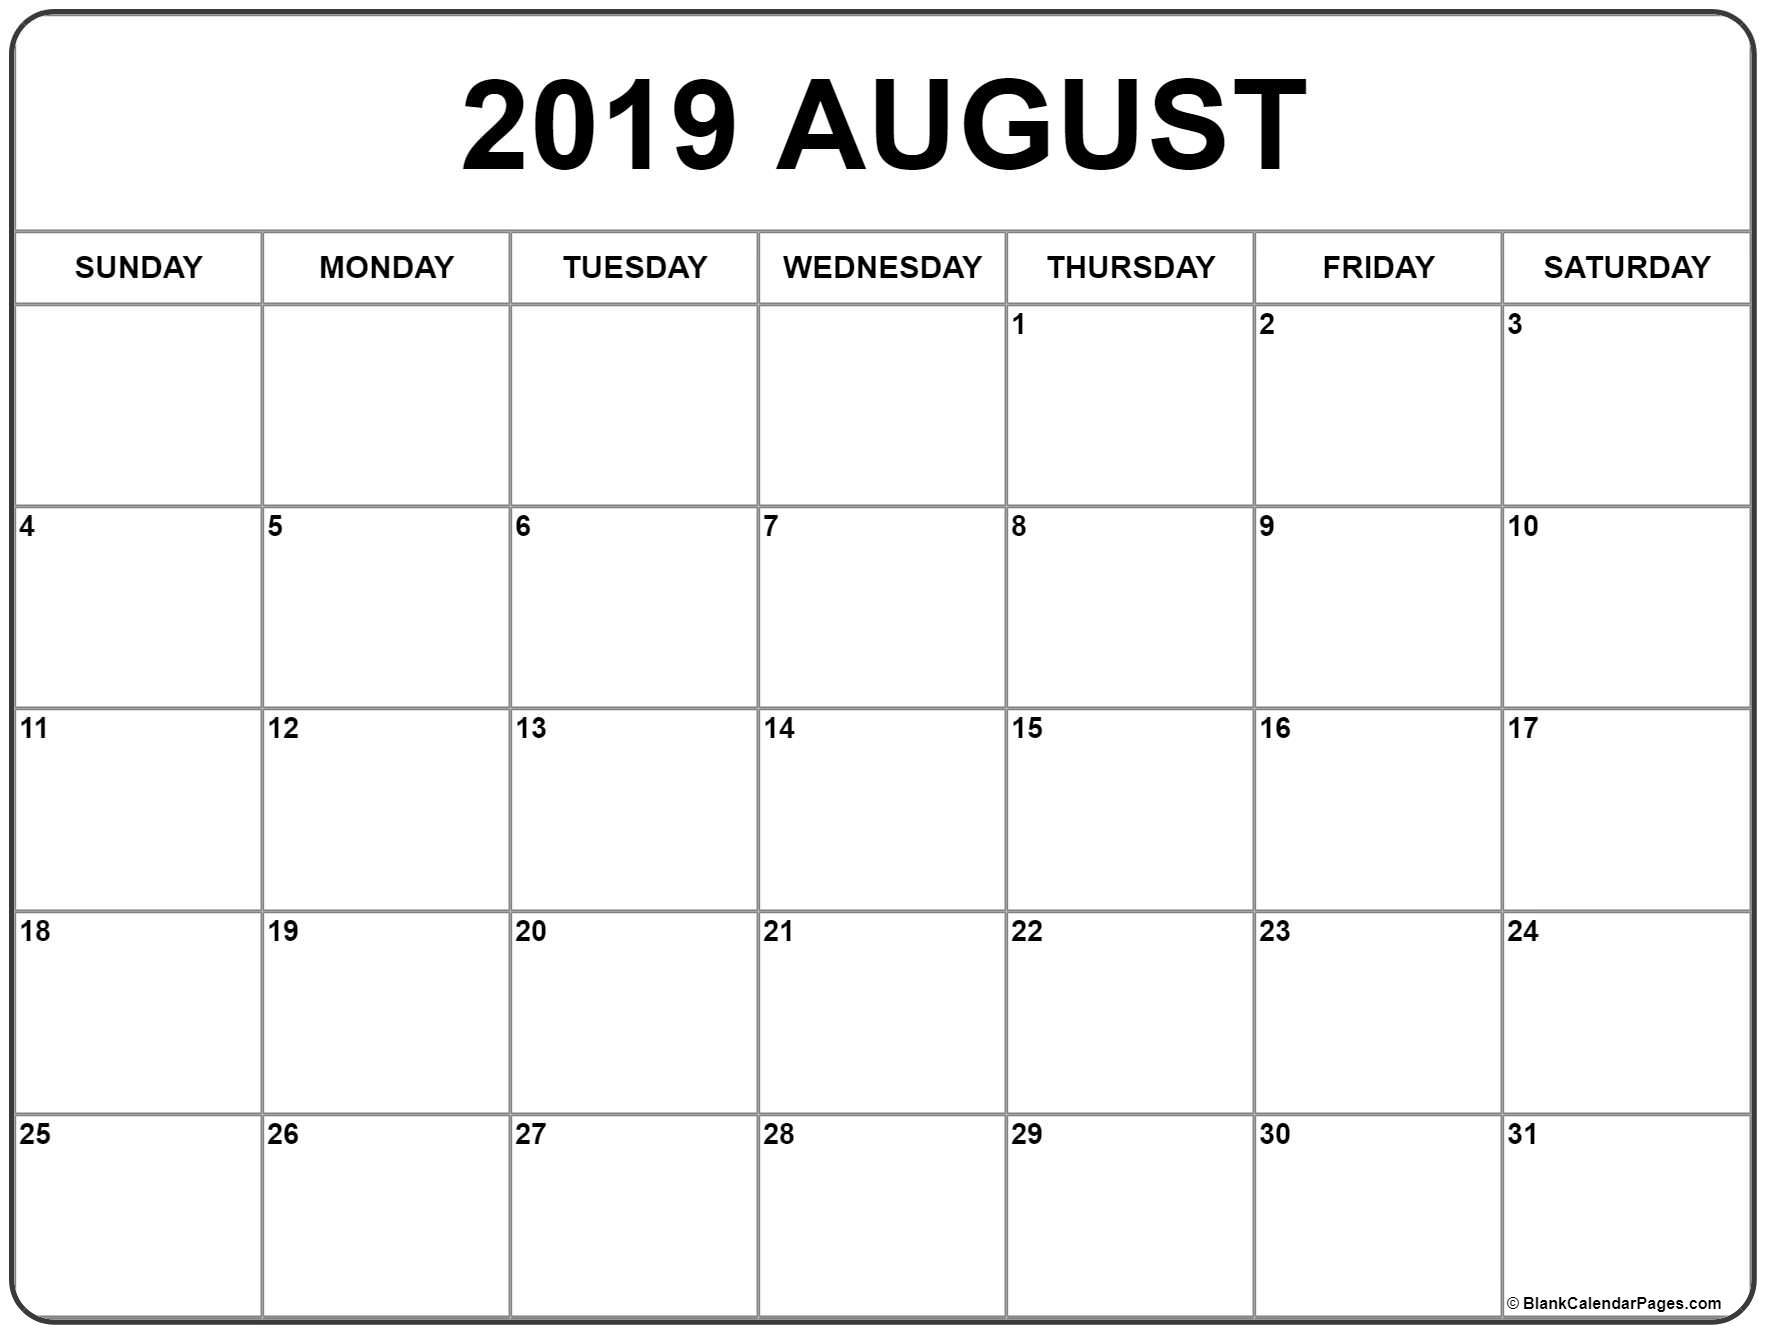 August 2019 Calendar | Free Printable Monthly Calendars